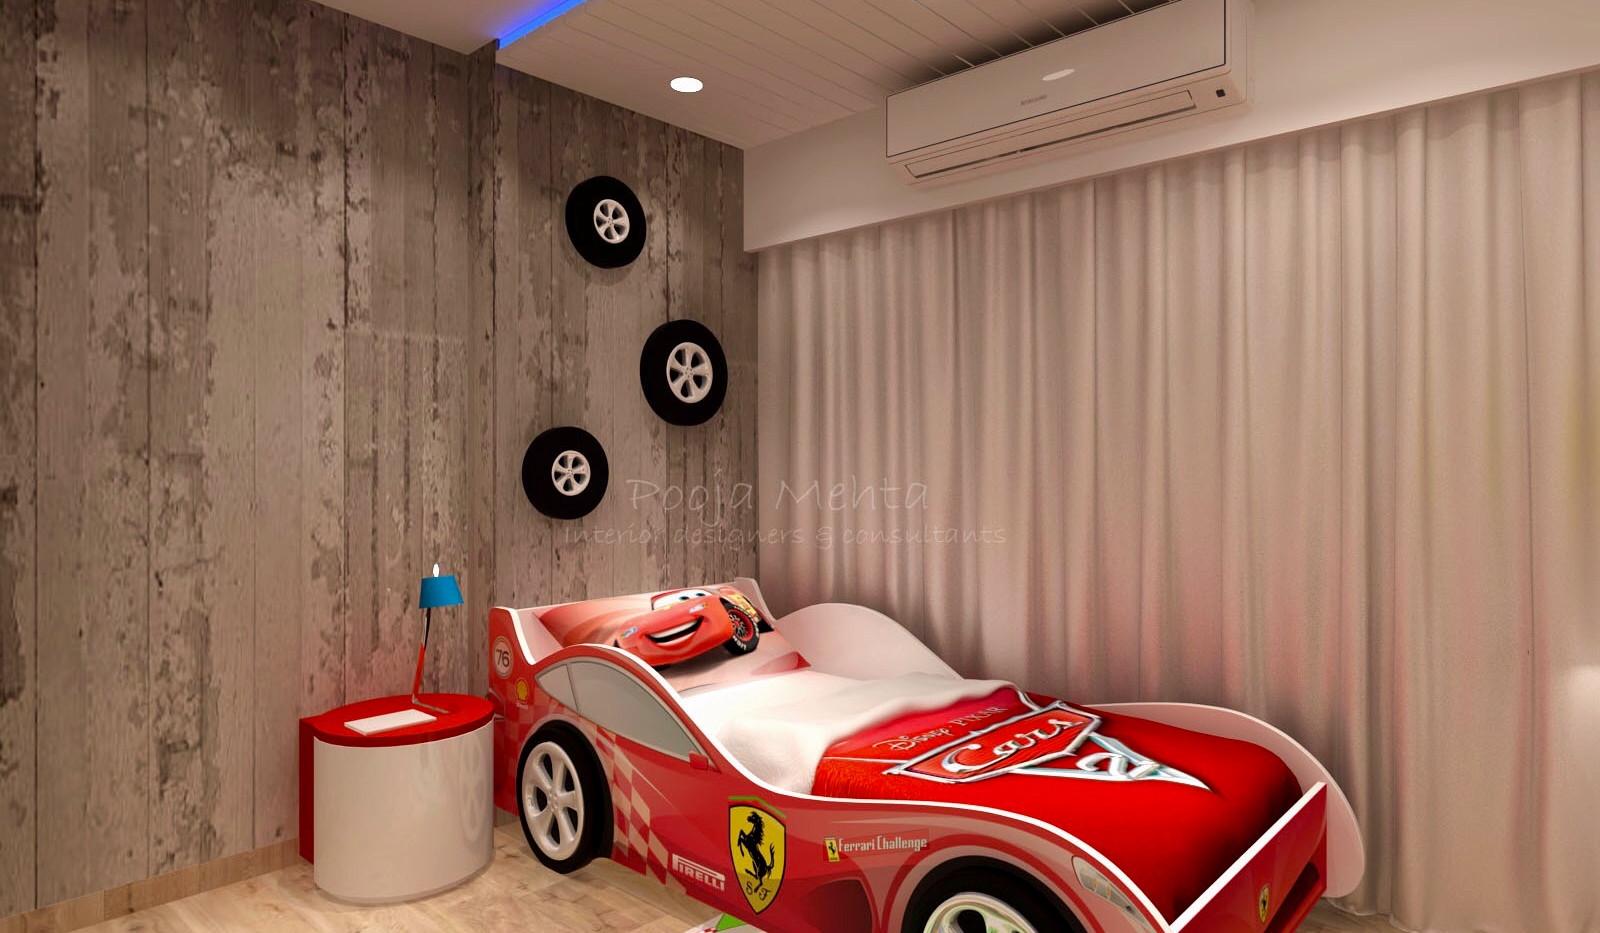 Top Residential Interior Designers Mumbai - Pooja Mehta Designing Dreams